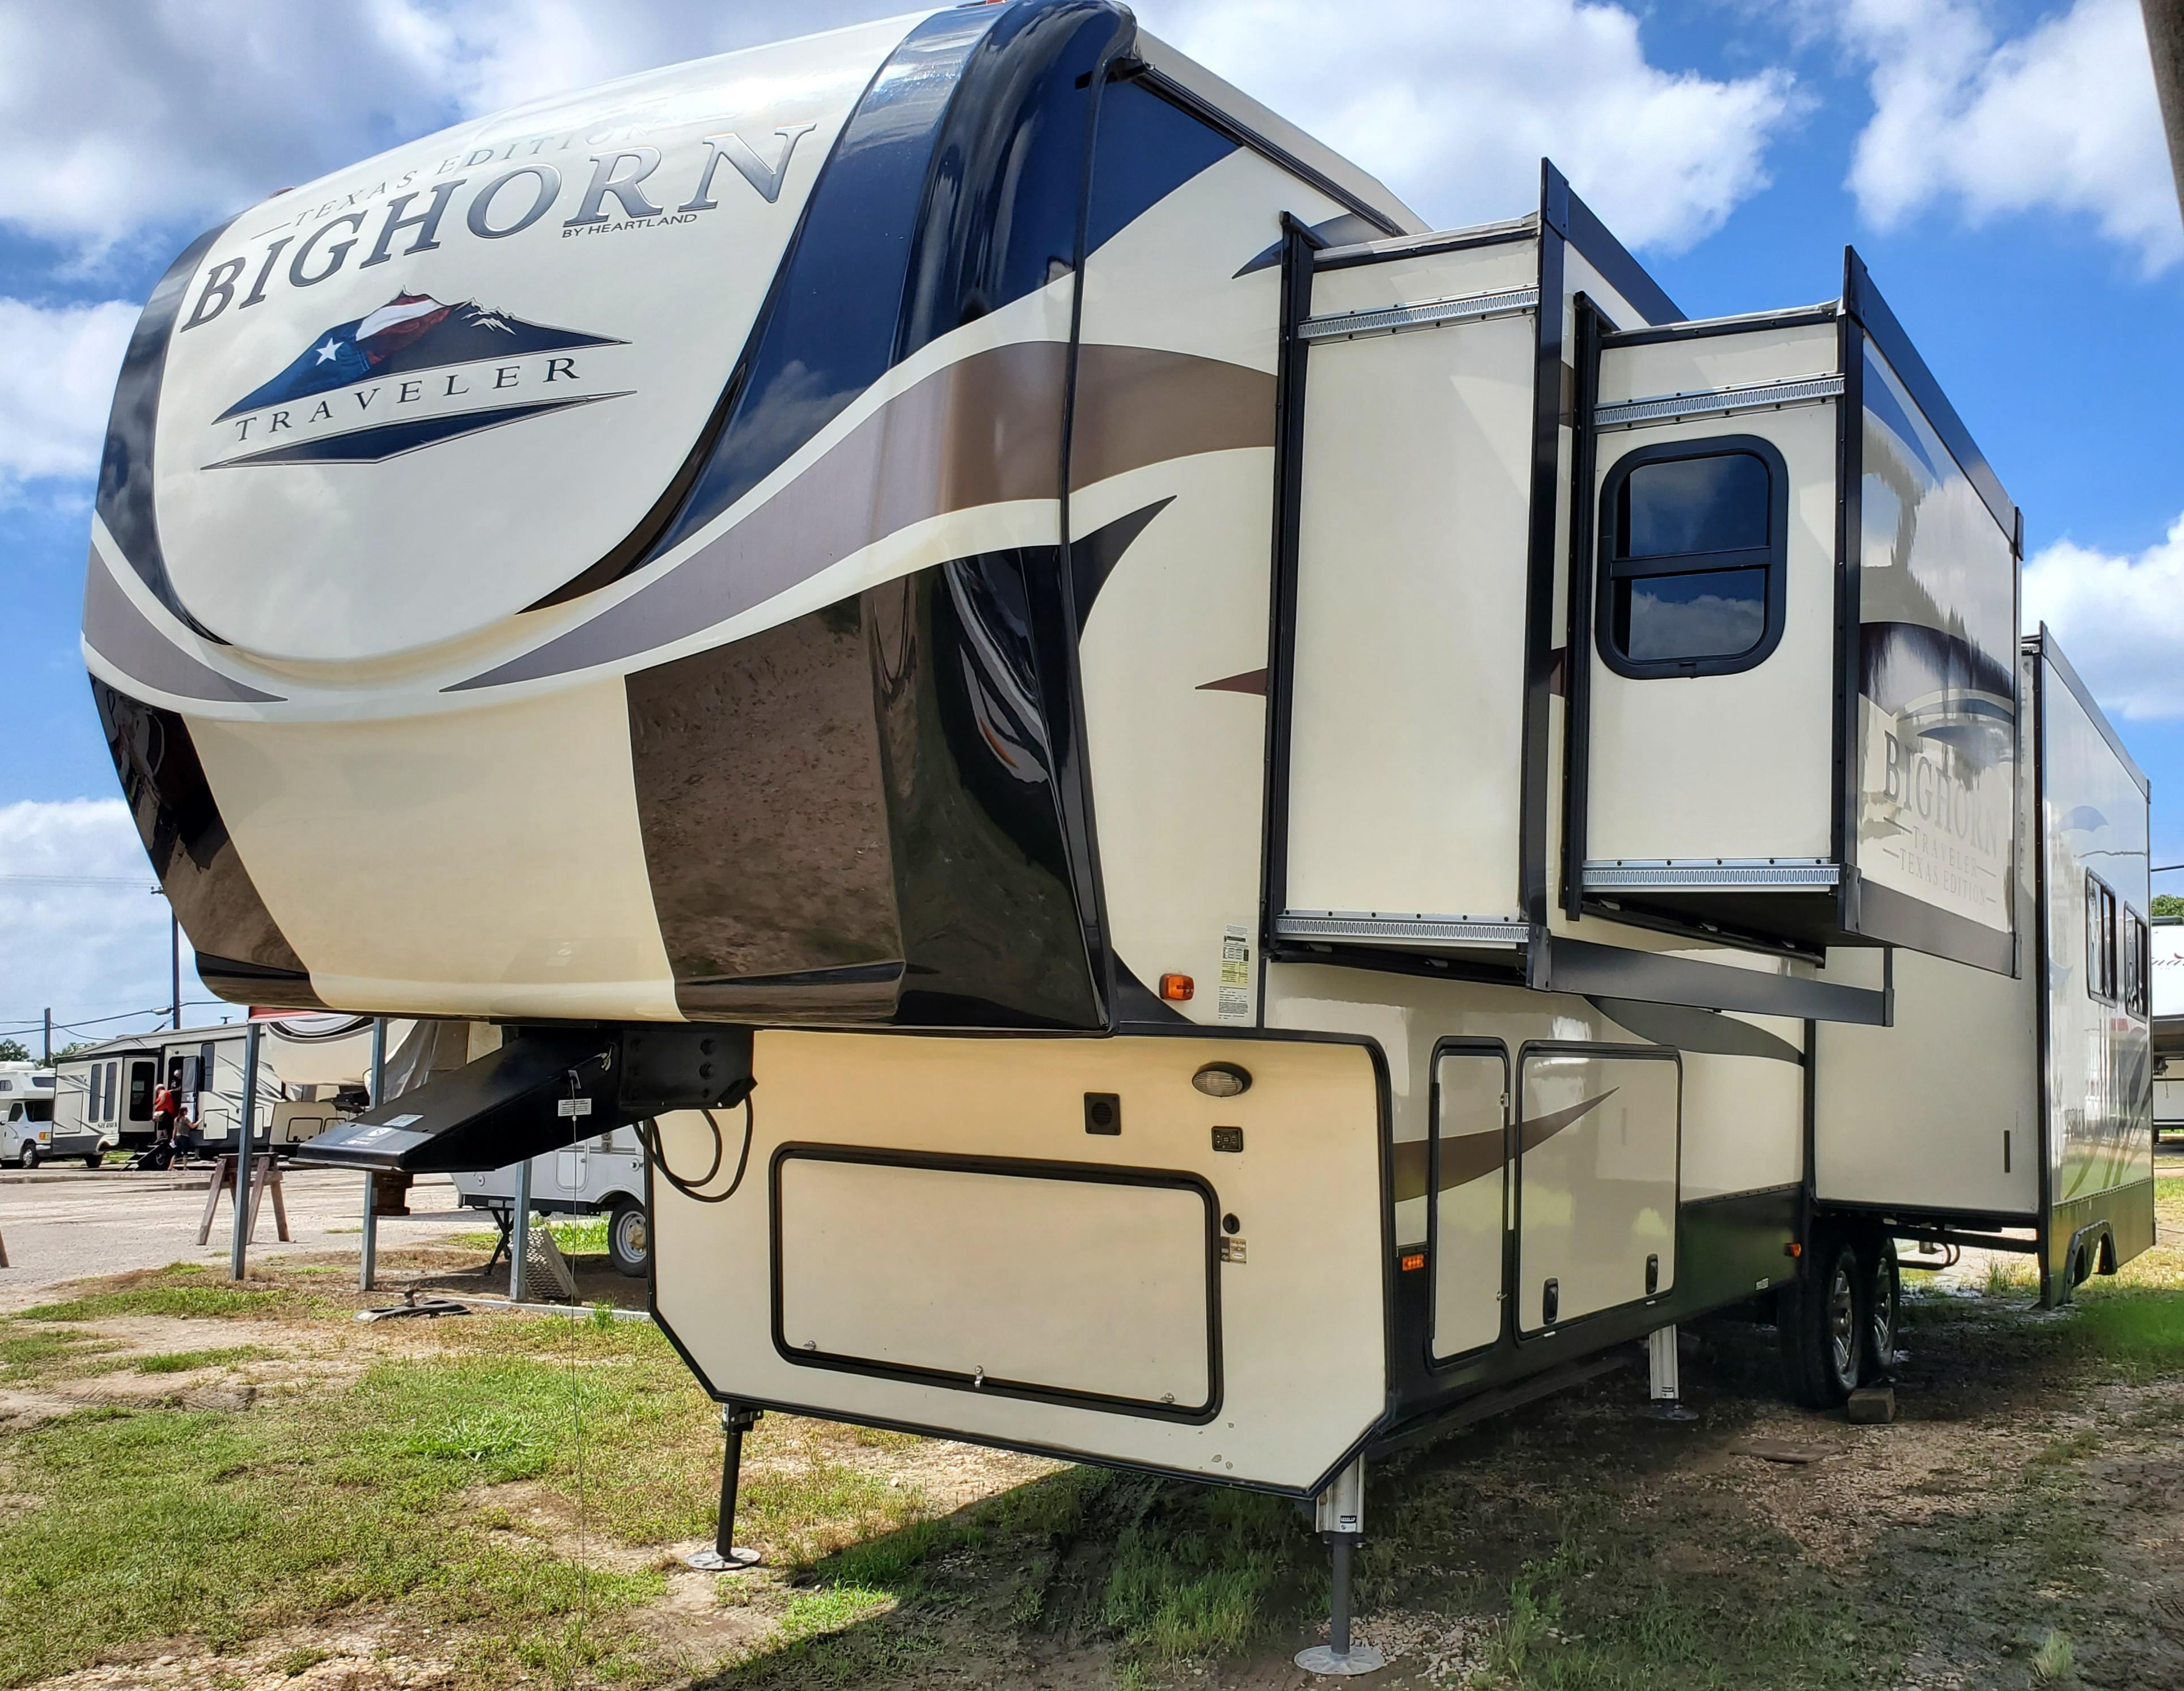 Used, 2019, Heartland, Bighorn Traveler BHTR 32 CK, Fifth Wheels